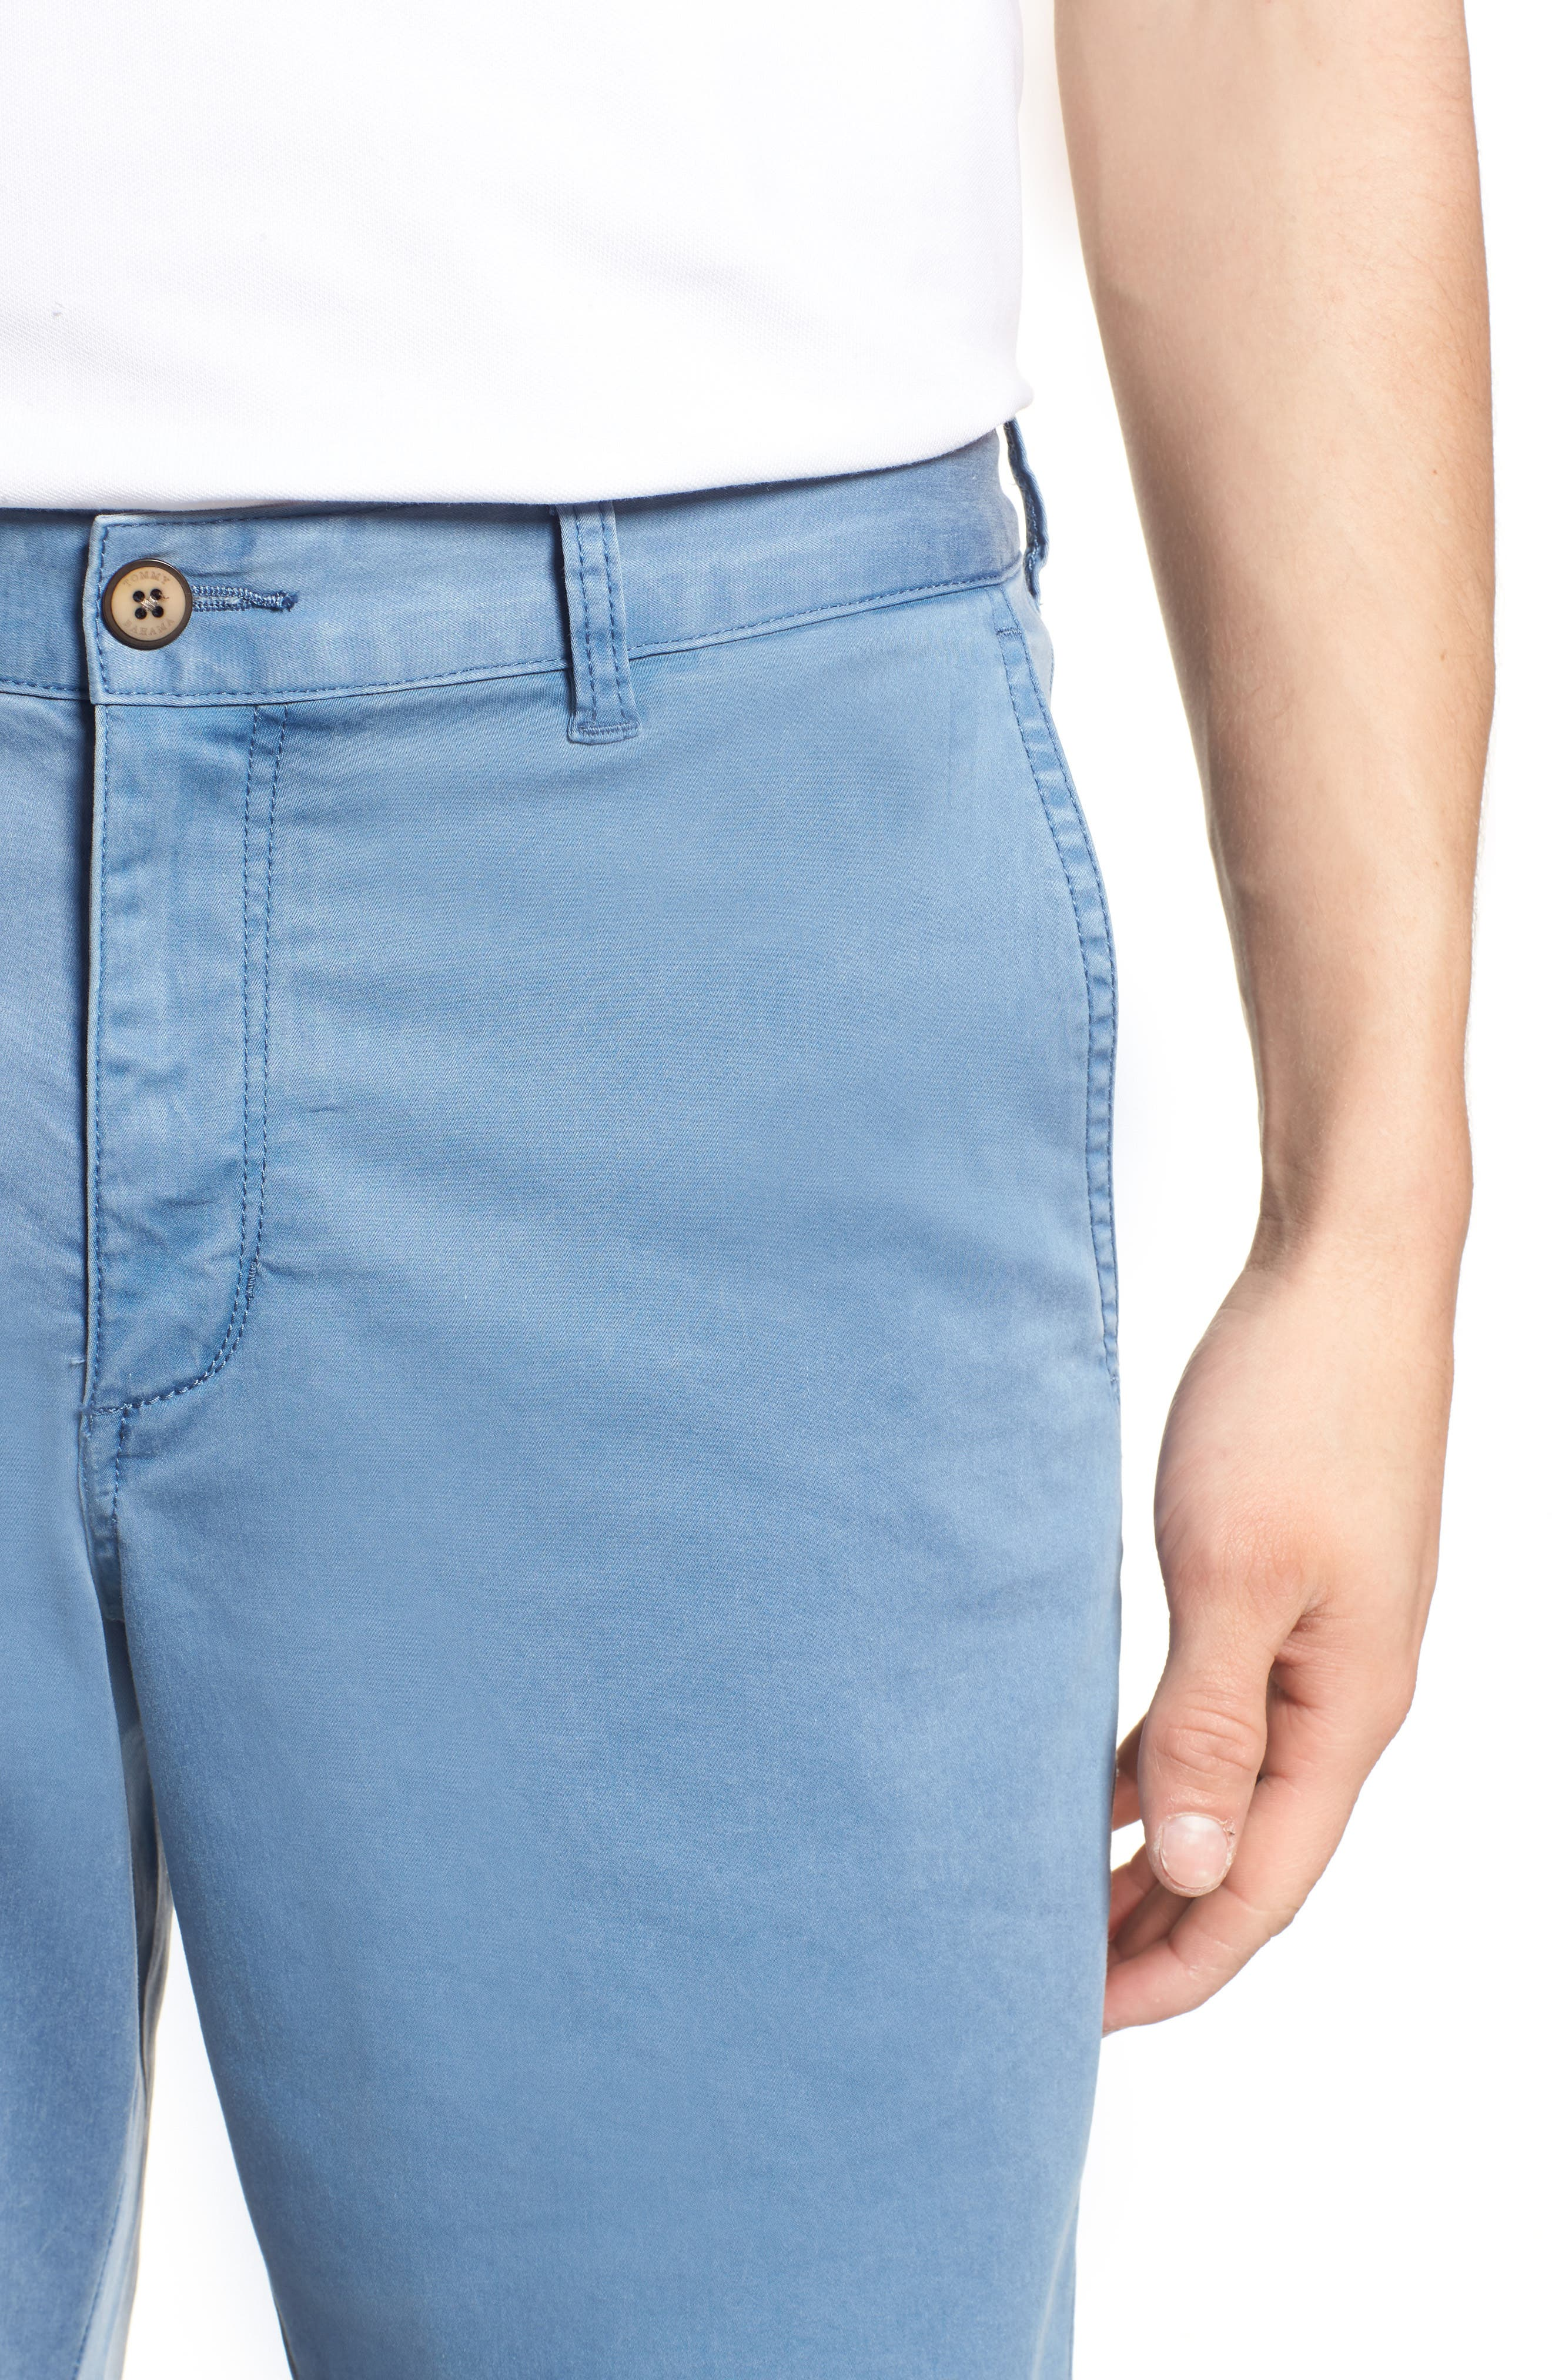 Boracay Chino Shorts,                             Alternate thumbnail 29, color,